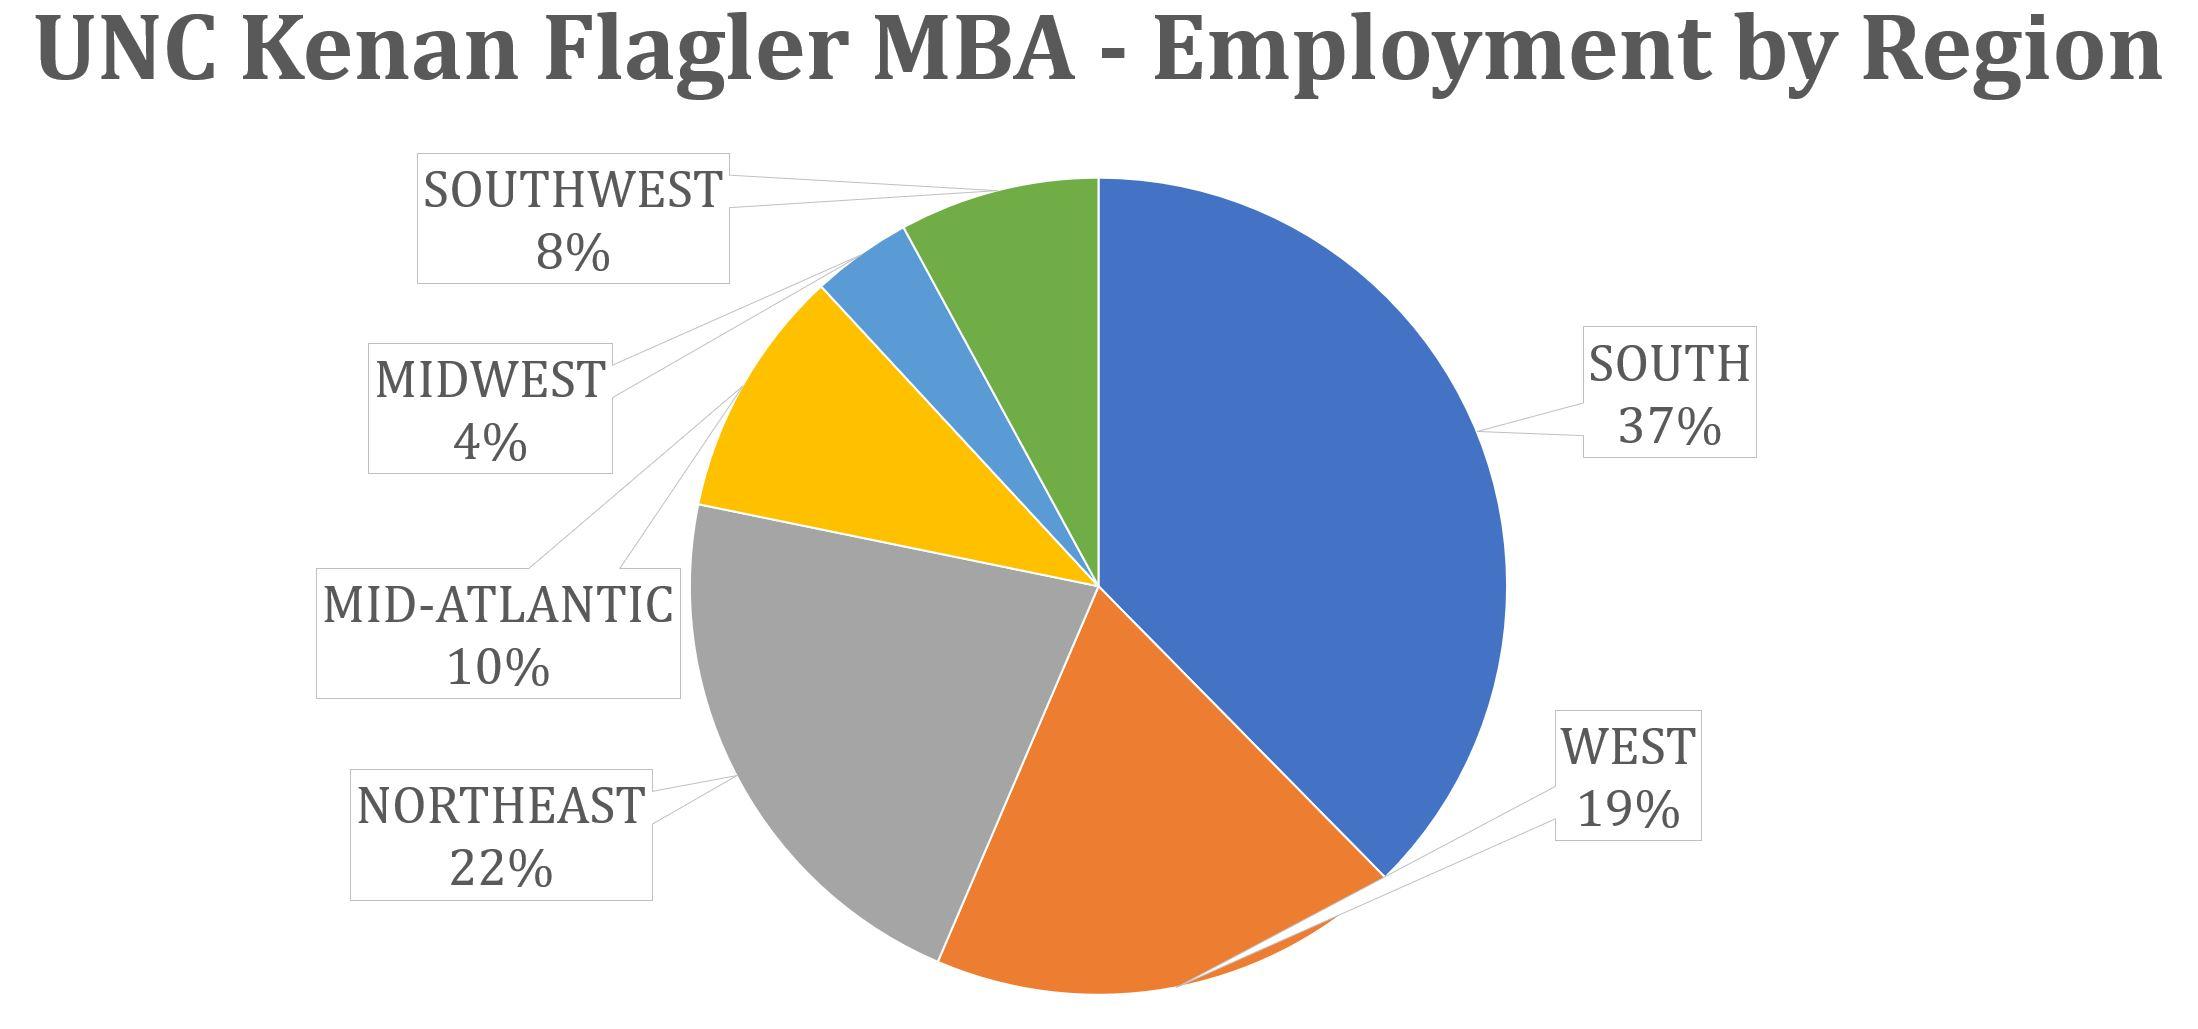 UNC Kenan Flagler MBA - Employment by Region